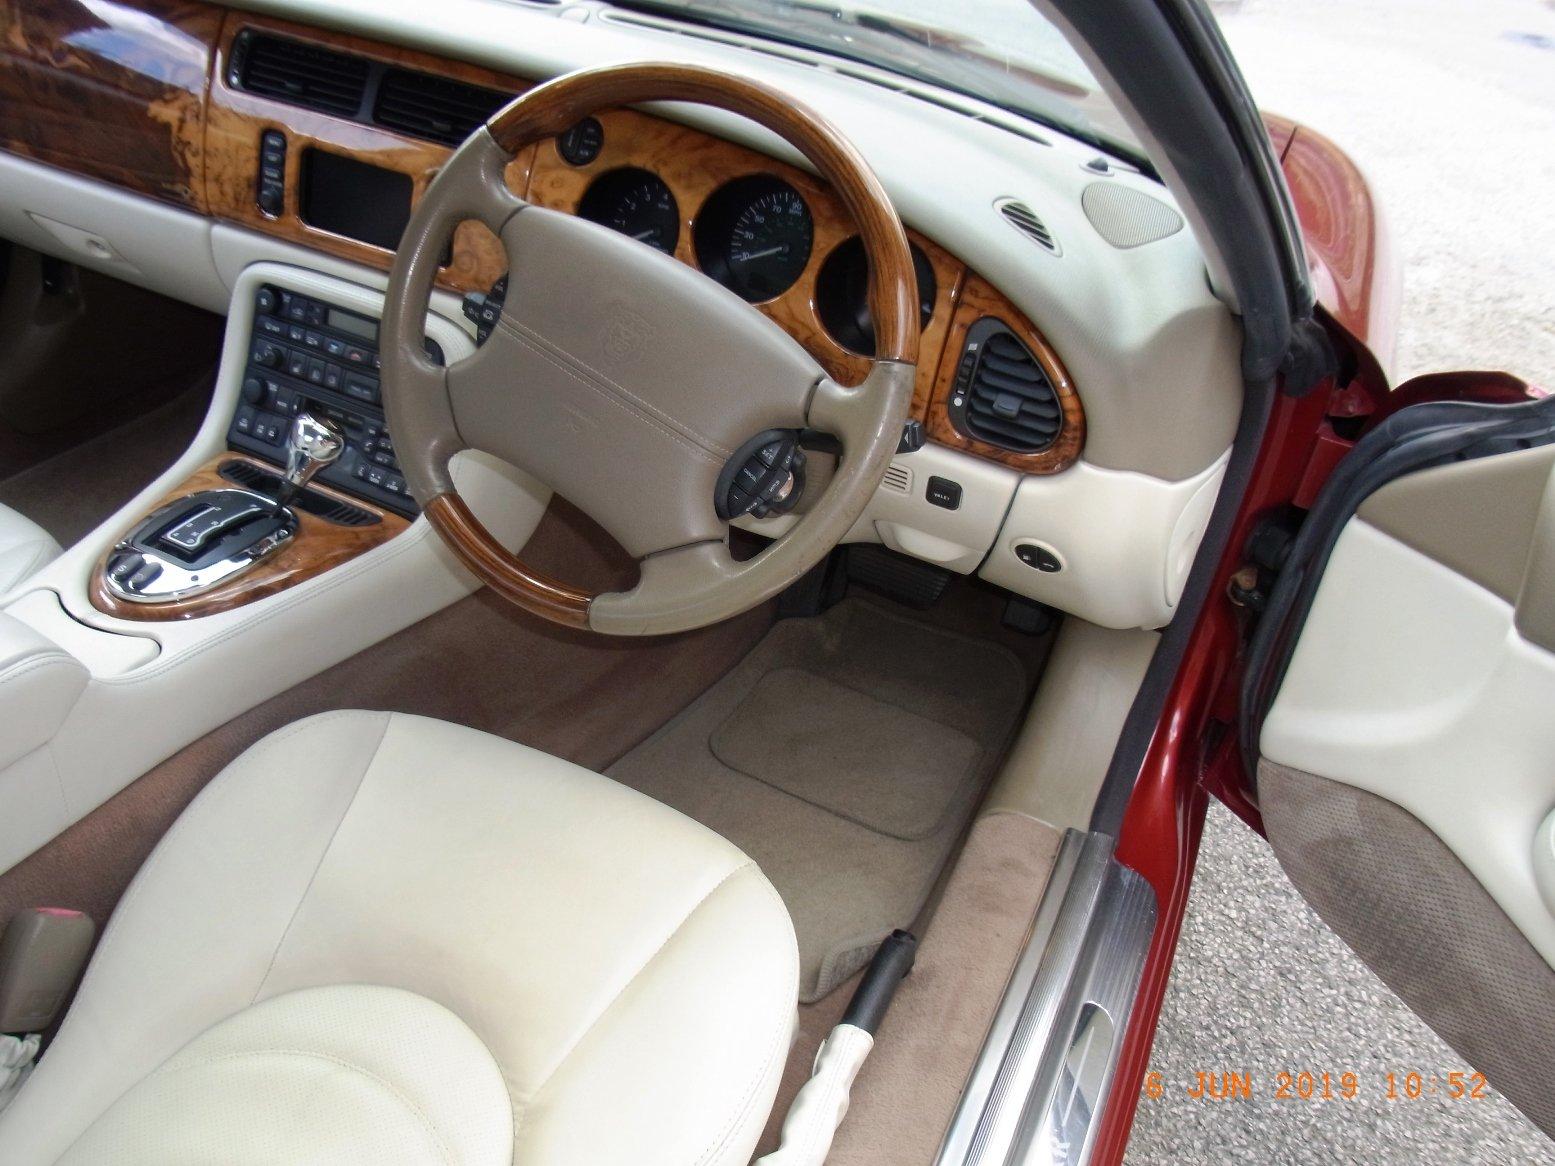 2002 Jaguar XKR 4.00 Litre Coupe For Sale (picture 6 of 6)